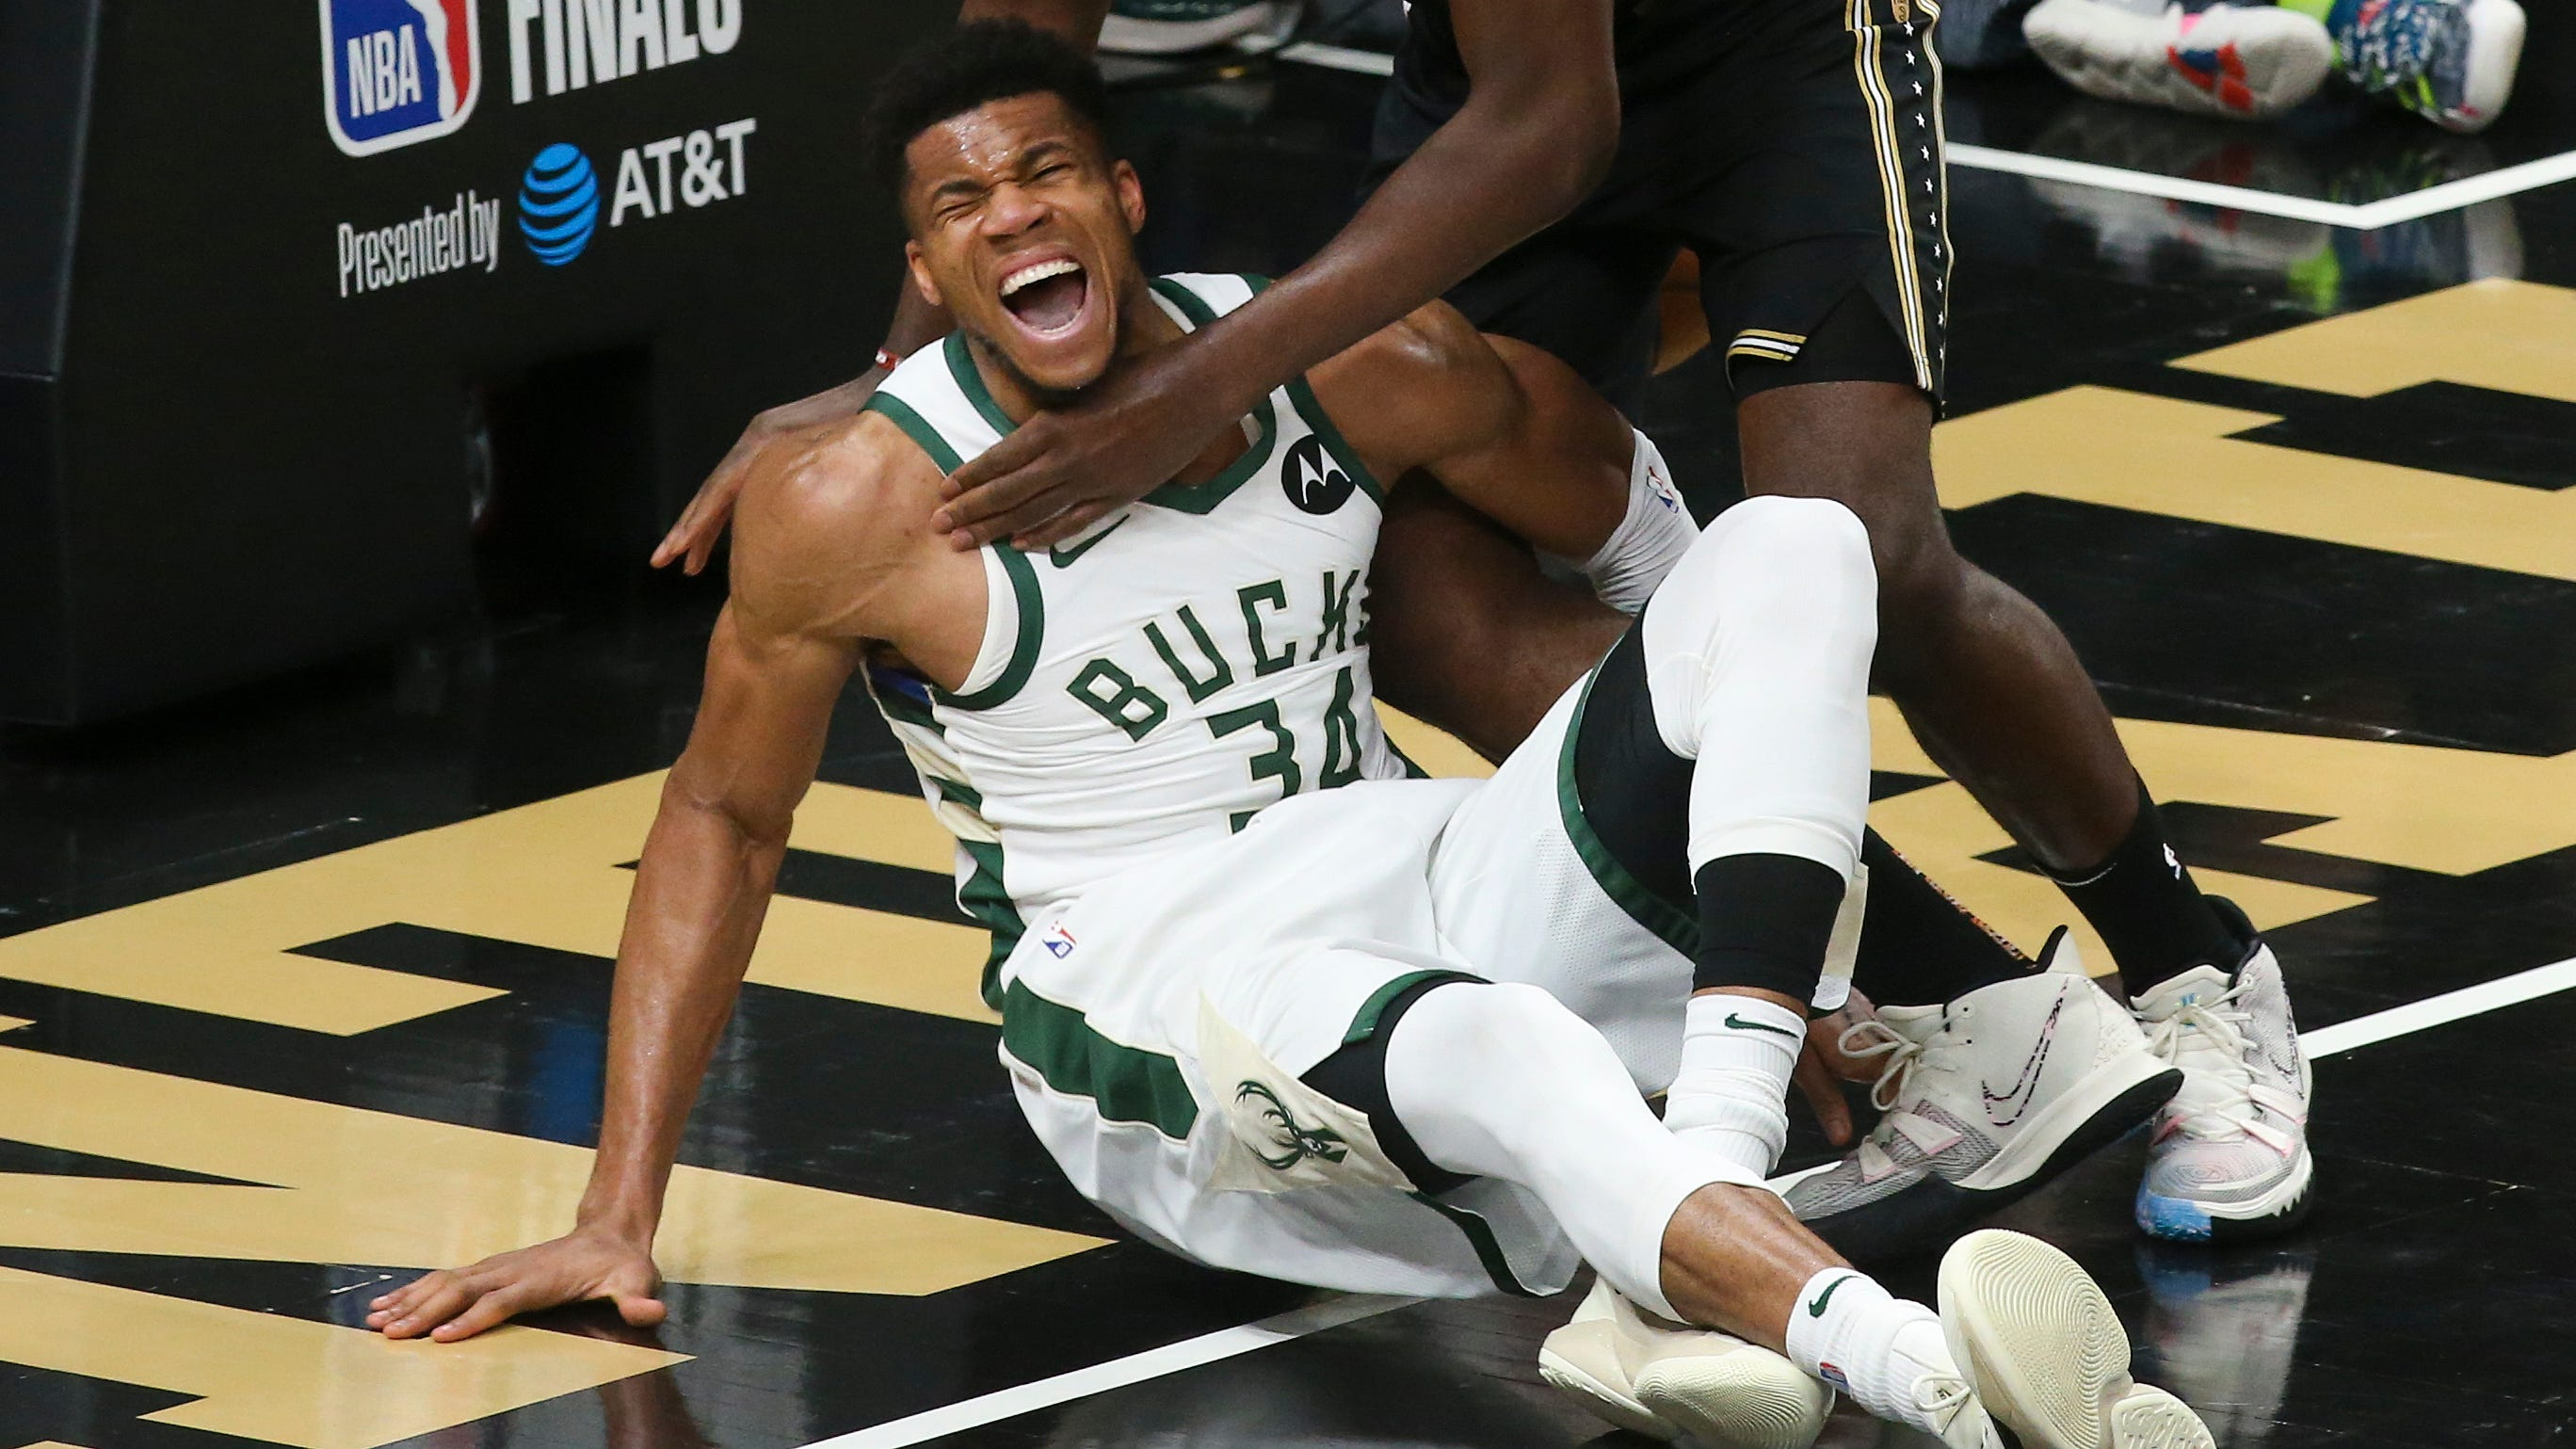 Giannis Antetokounmpo's knee injury leaves Bucks in limbo